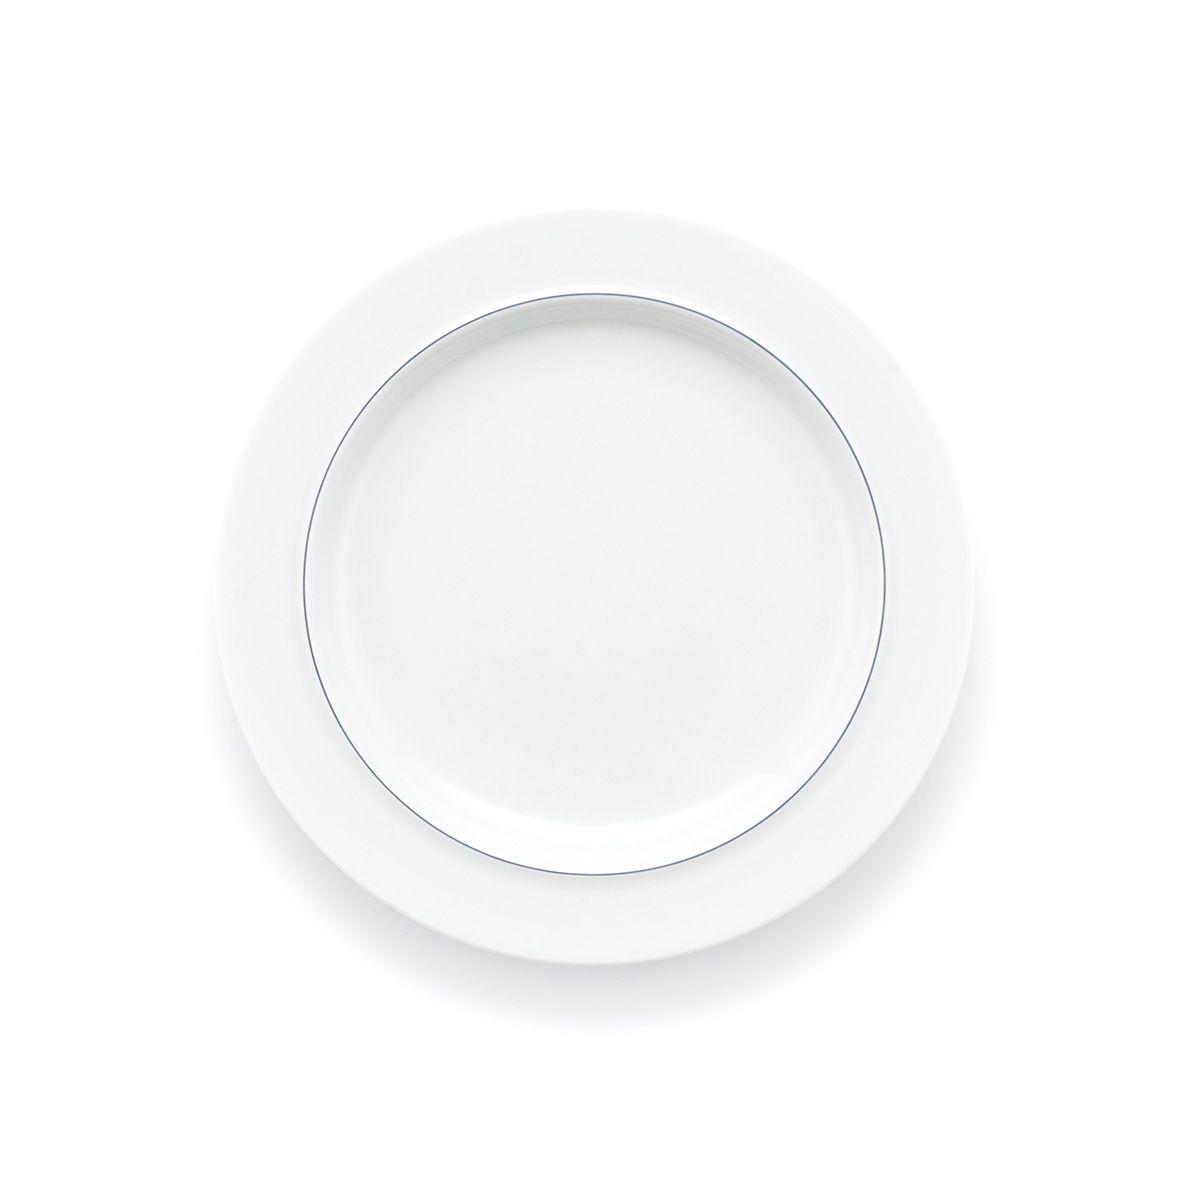 Plate BLAA Bodum